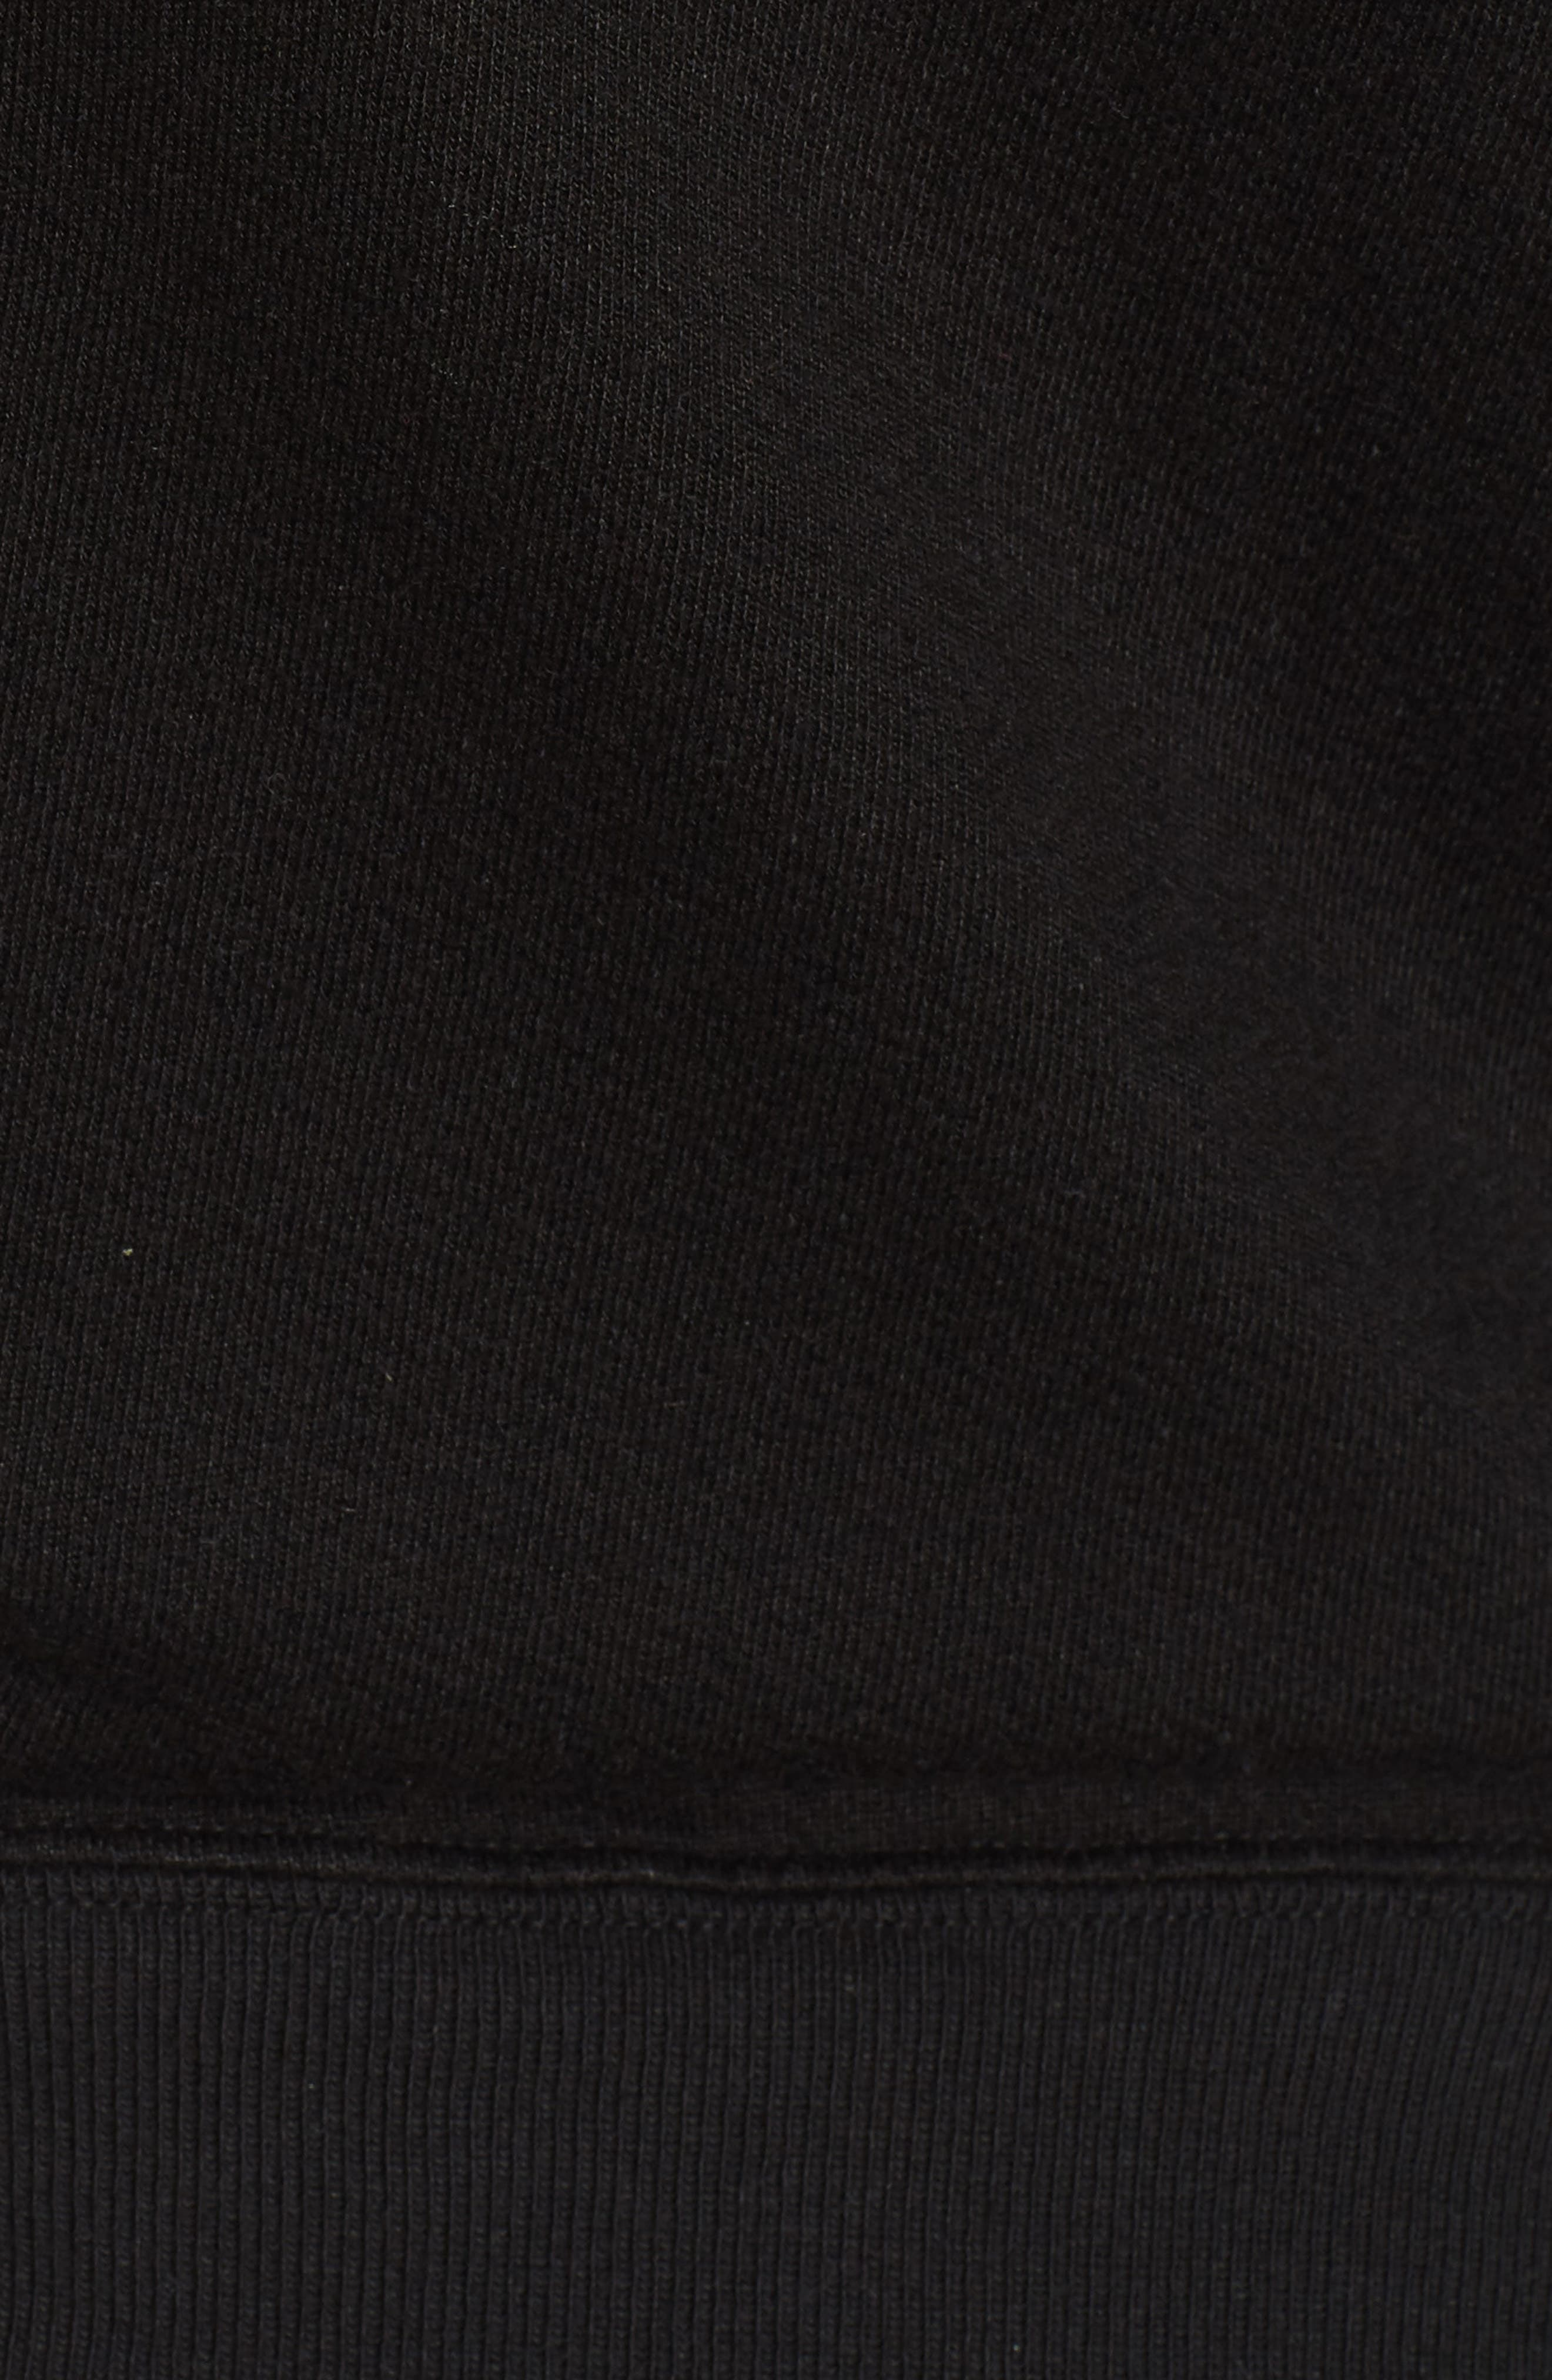 Mayer V-Neck Sweatshirt,                             Alternate thumbnail 5, color,                             002